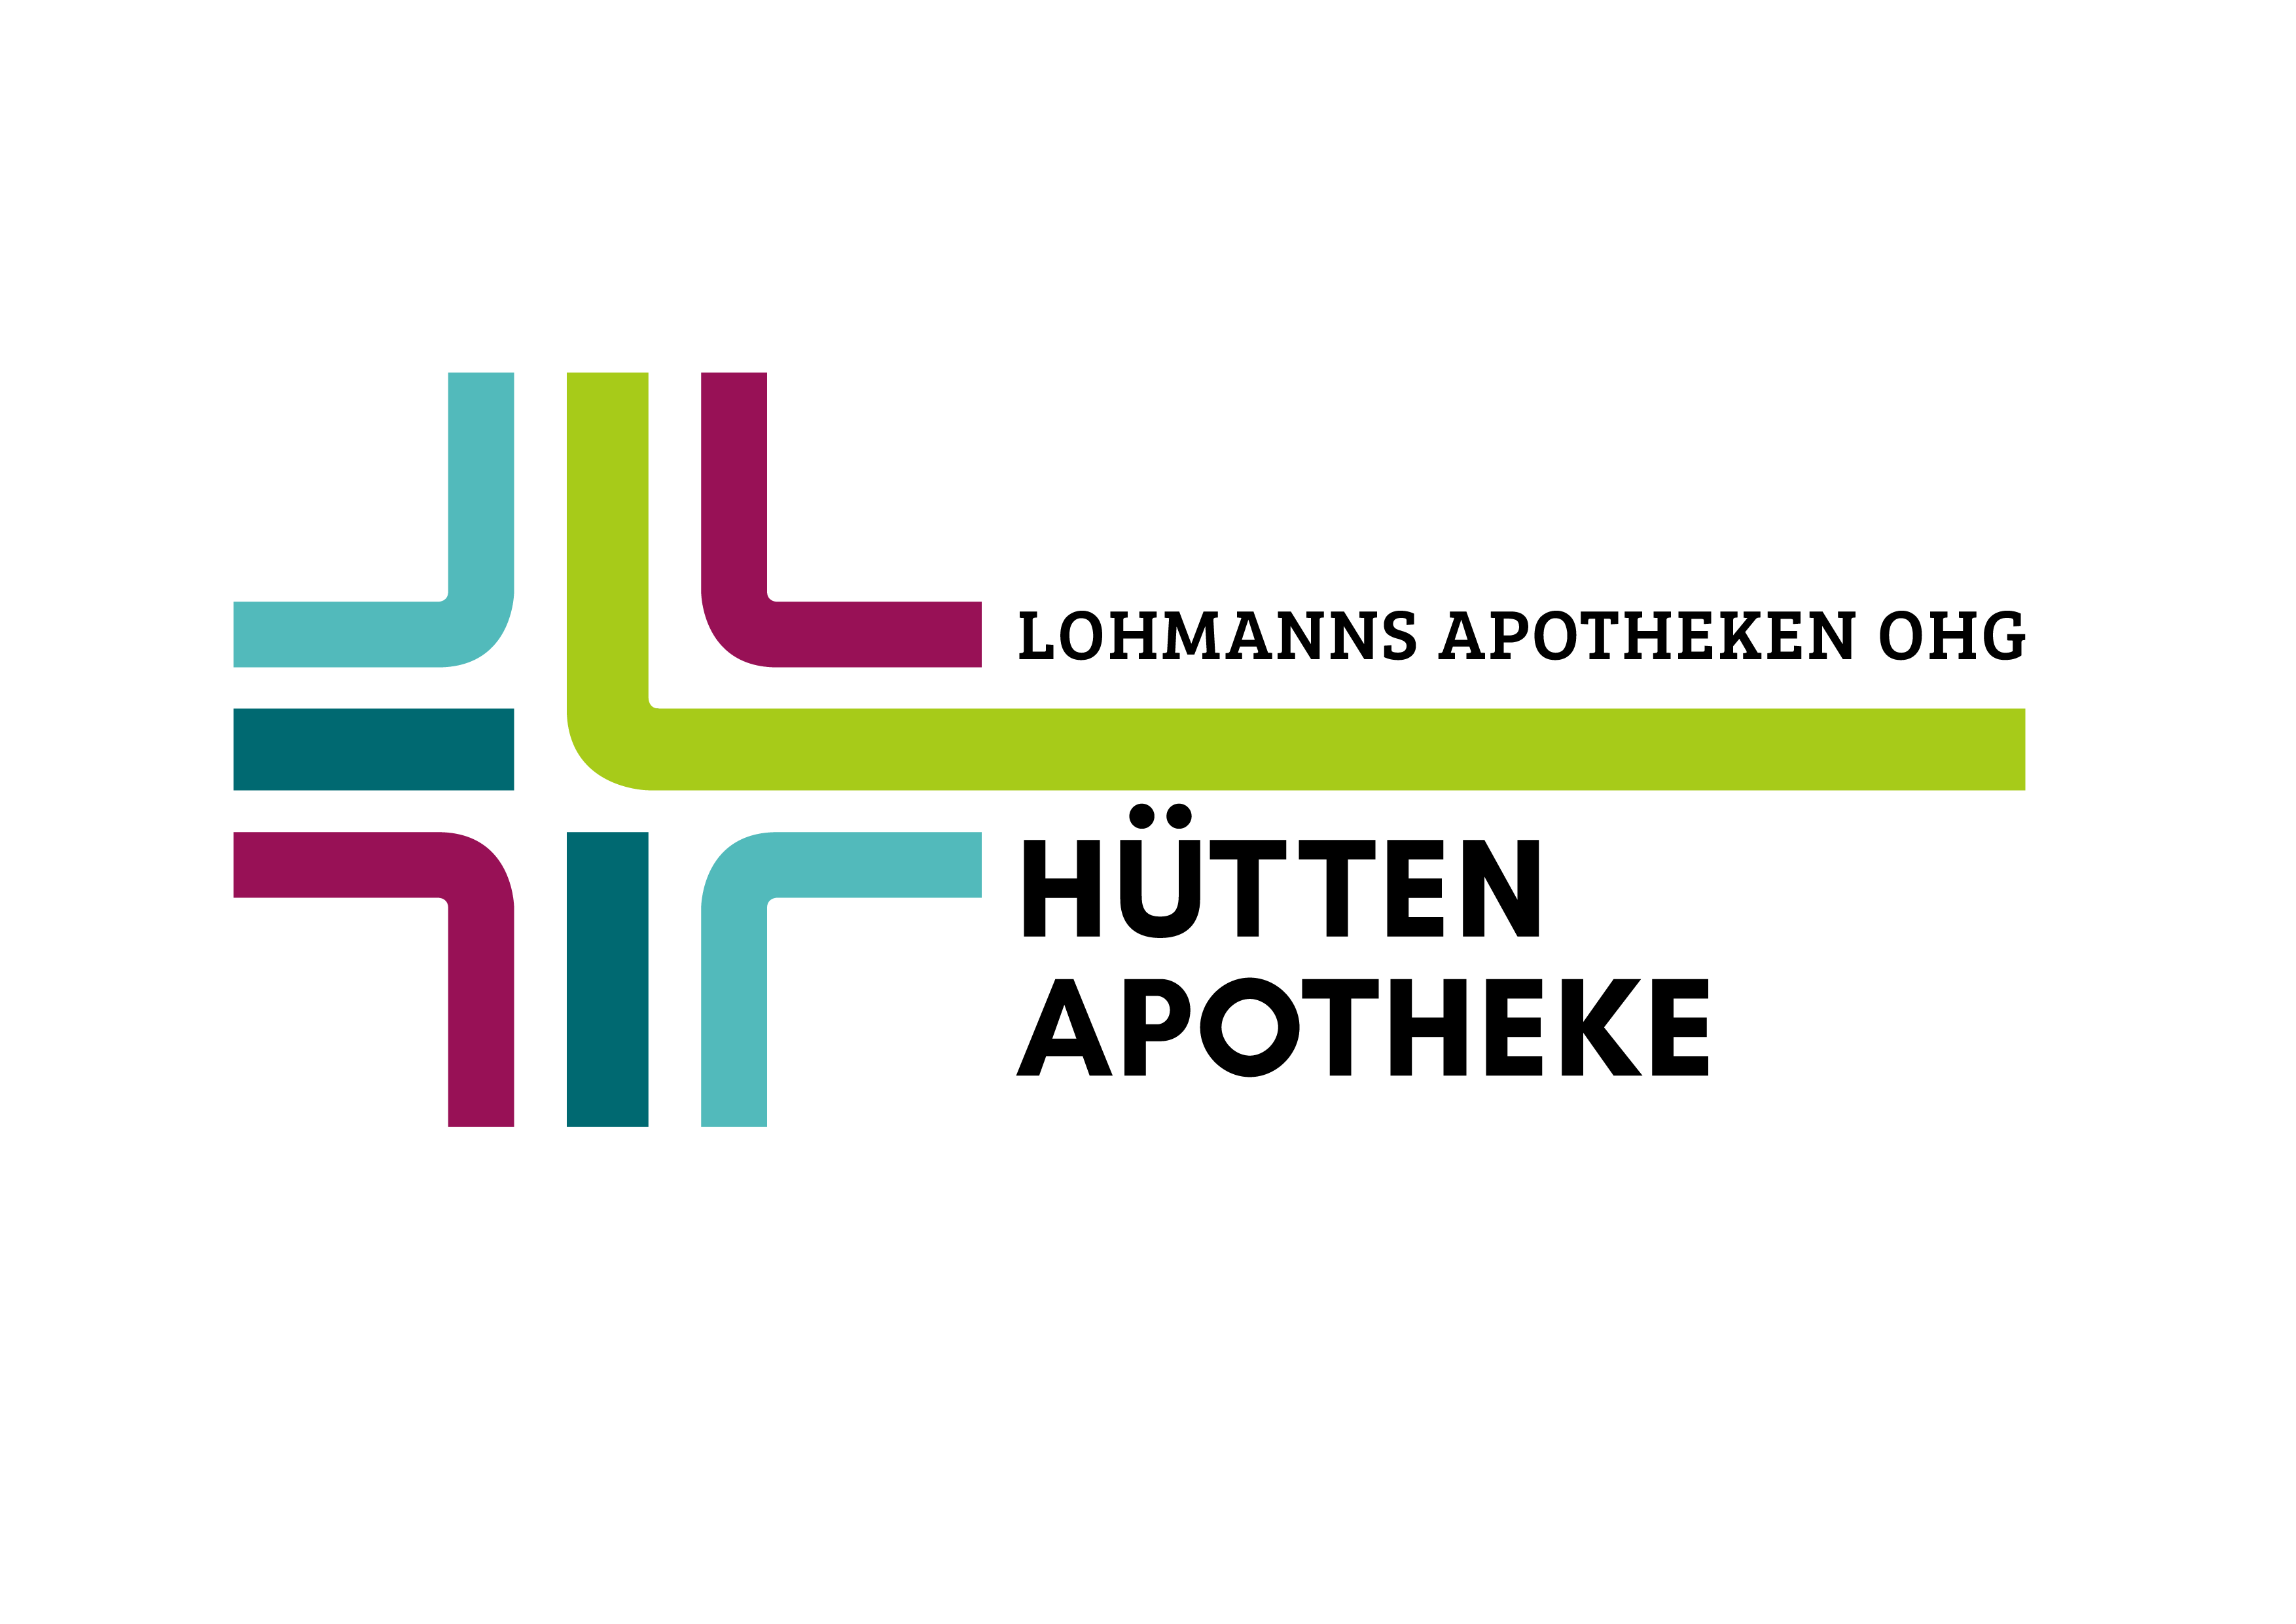 Logo der Hütten-Apotheke, Lohmanns Apotheken OHG